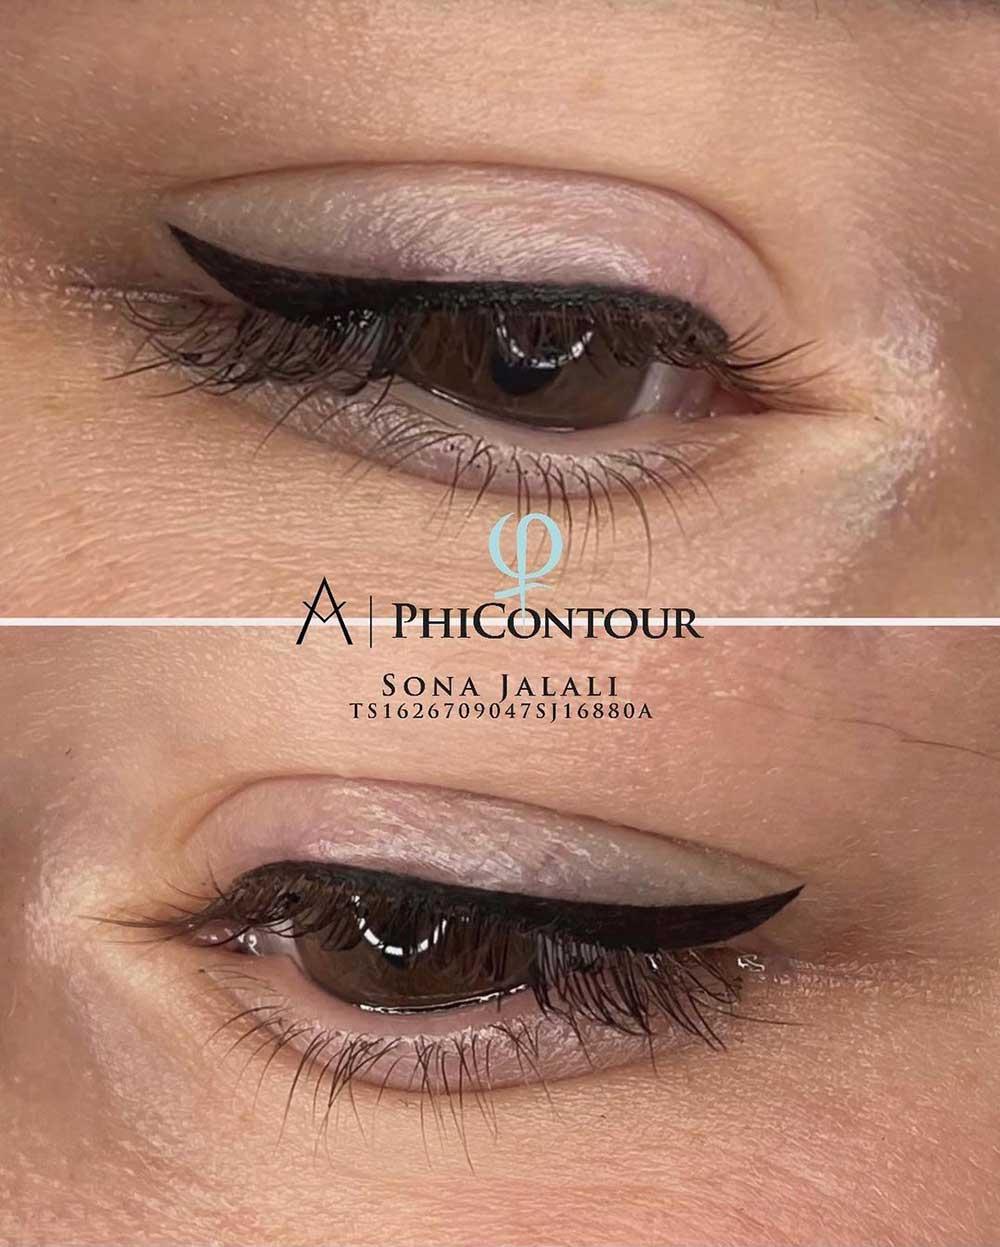 PMU Tattoo Eyeliner Aftercare Days 1-10